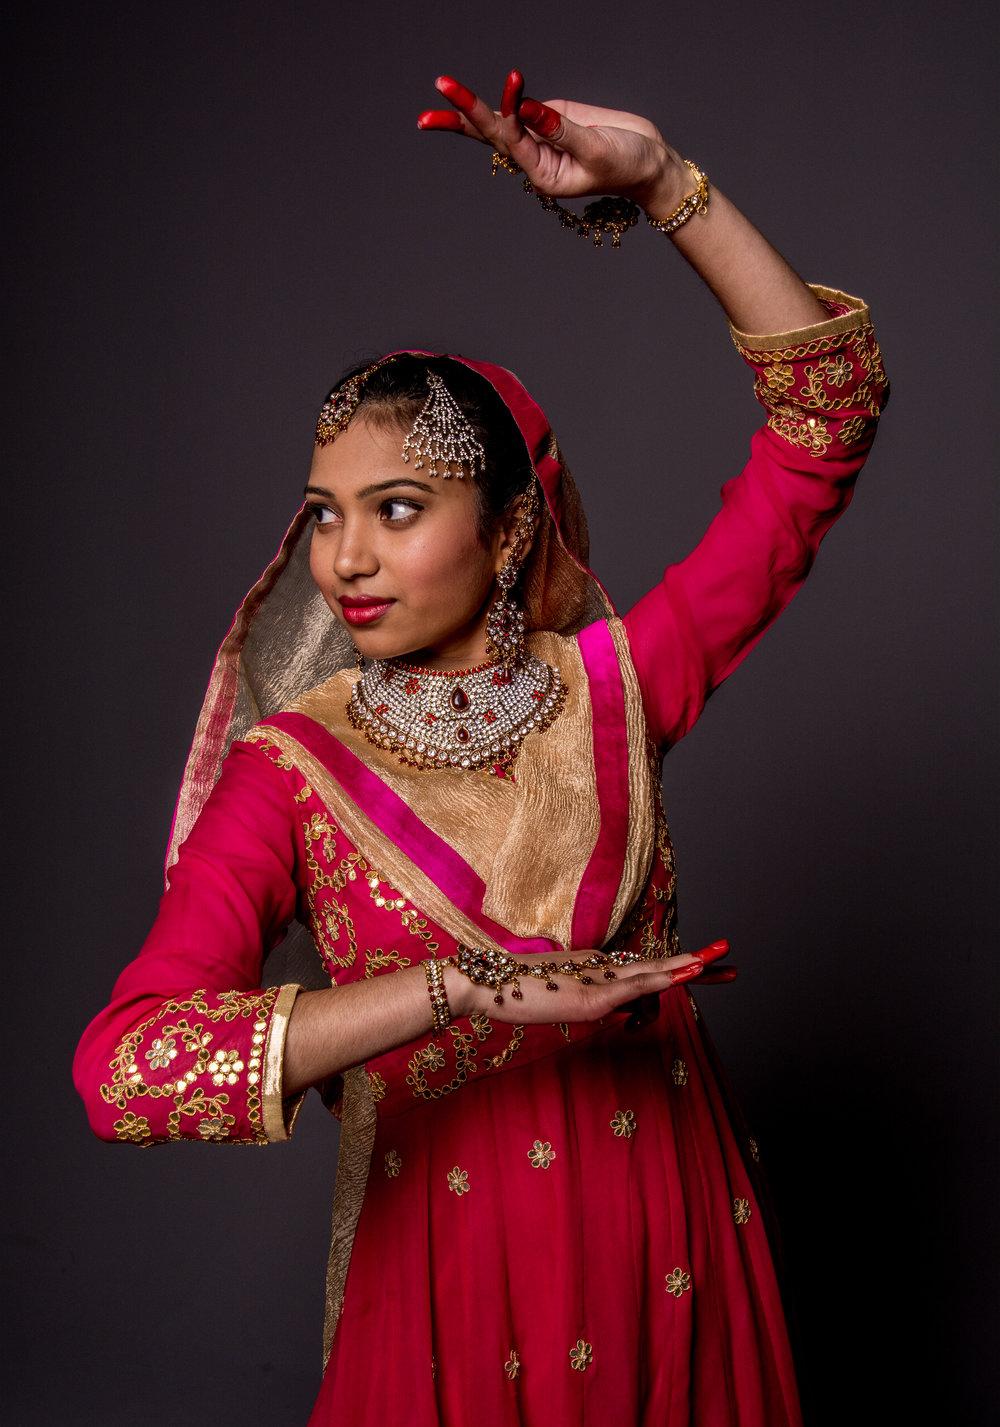 Ritika&RishaMehta_StudioPortraits_MuncieIndiana_March2017_SamanthaRosePhotography_-116.jpg